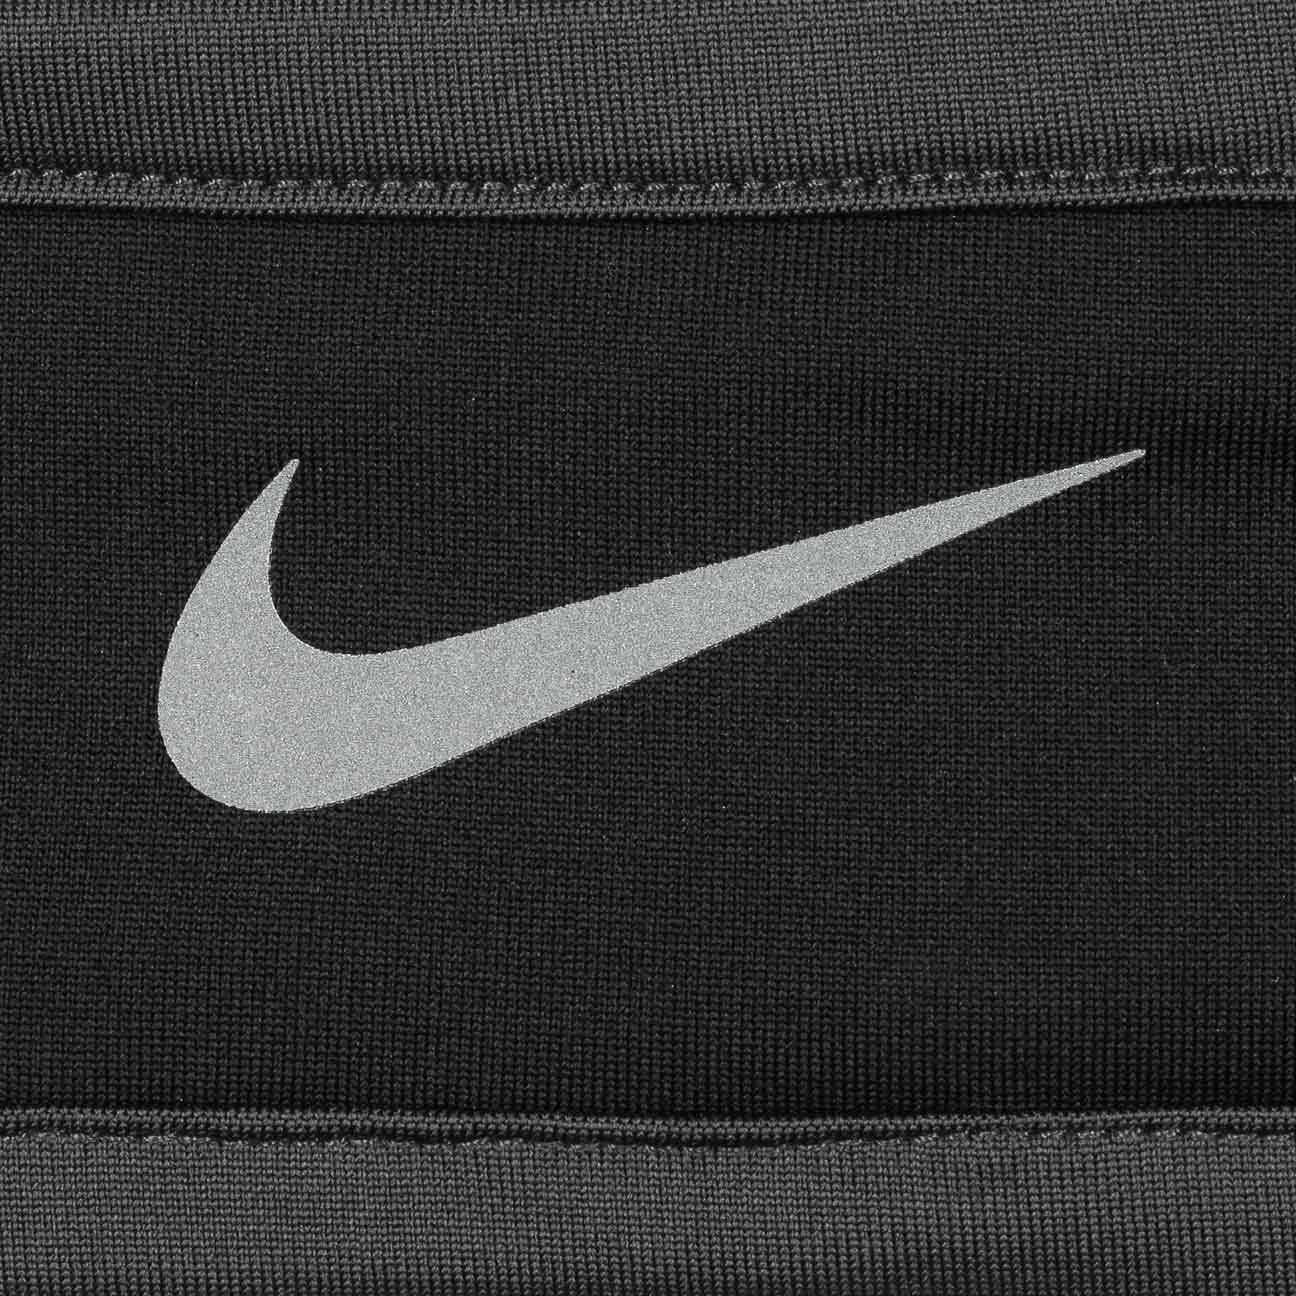 Nike Run-Dry Headband and Gloves Set Black Grey Silver